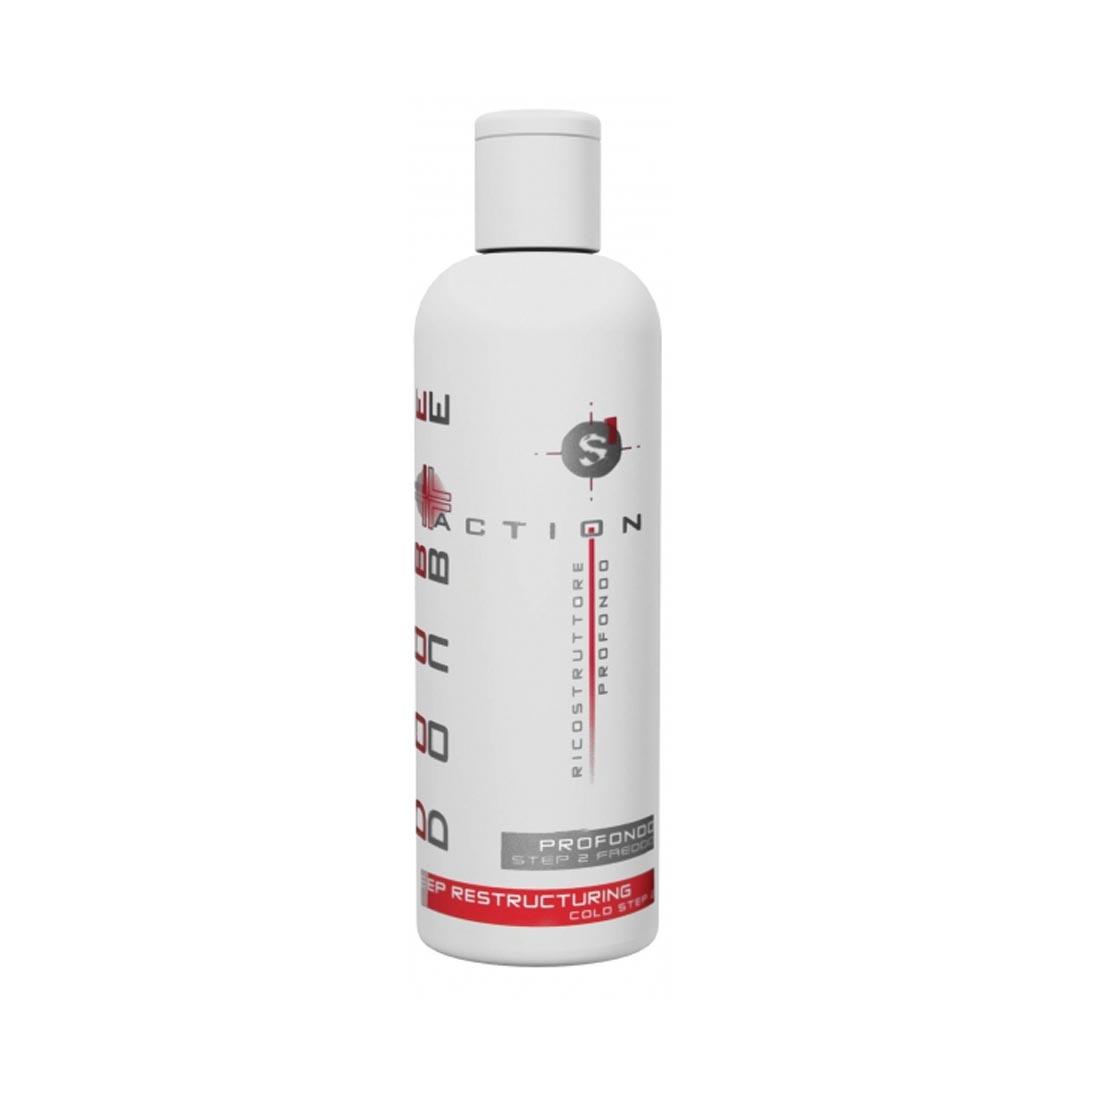 Hair Company Регенерирующее средство холодной фазы Double Action Ricostruttore Profondo Step 2 Freddo 250 мл (Hair Company Professional)